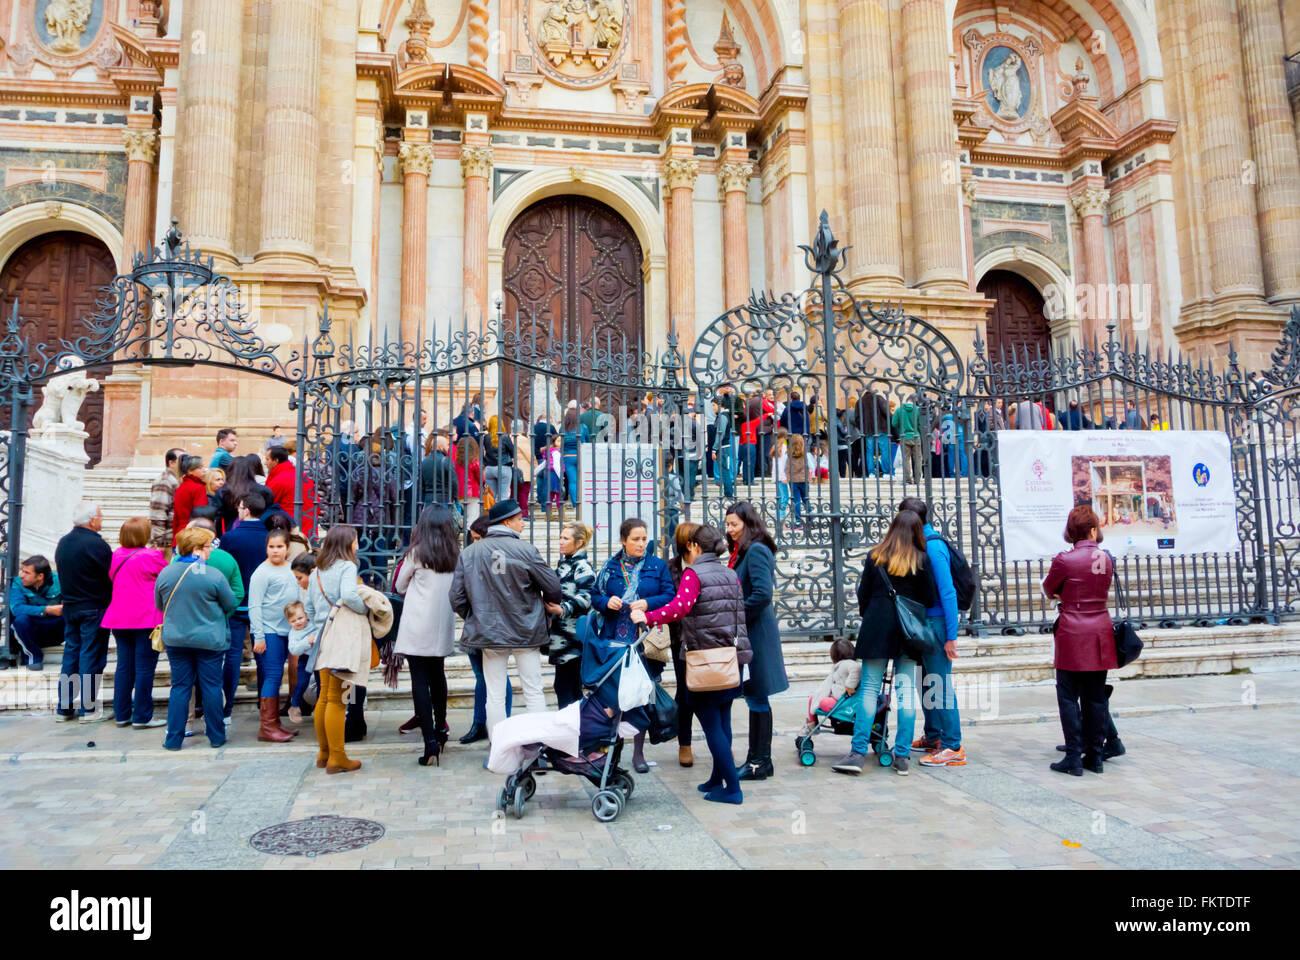 File d'attente à la Cathédrale, la Plaza Obispo, vieille ville, Malaga, Andalousie, Espagne Photo Stock